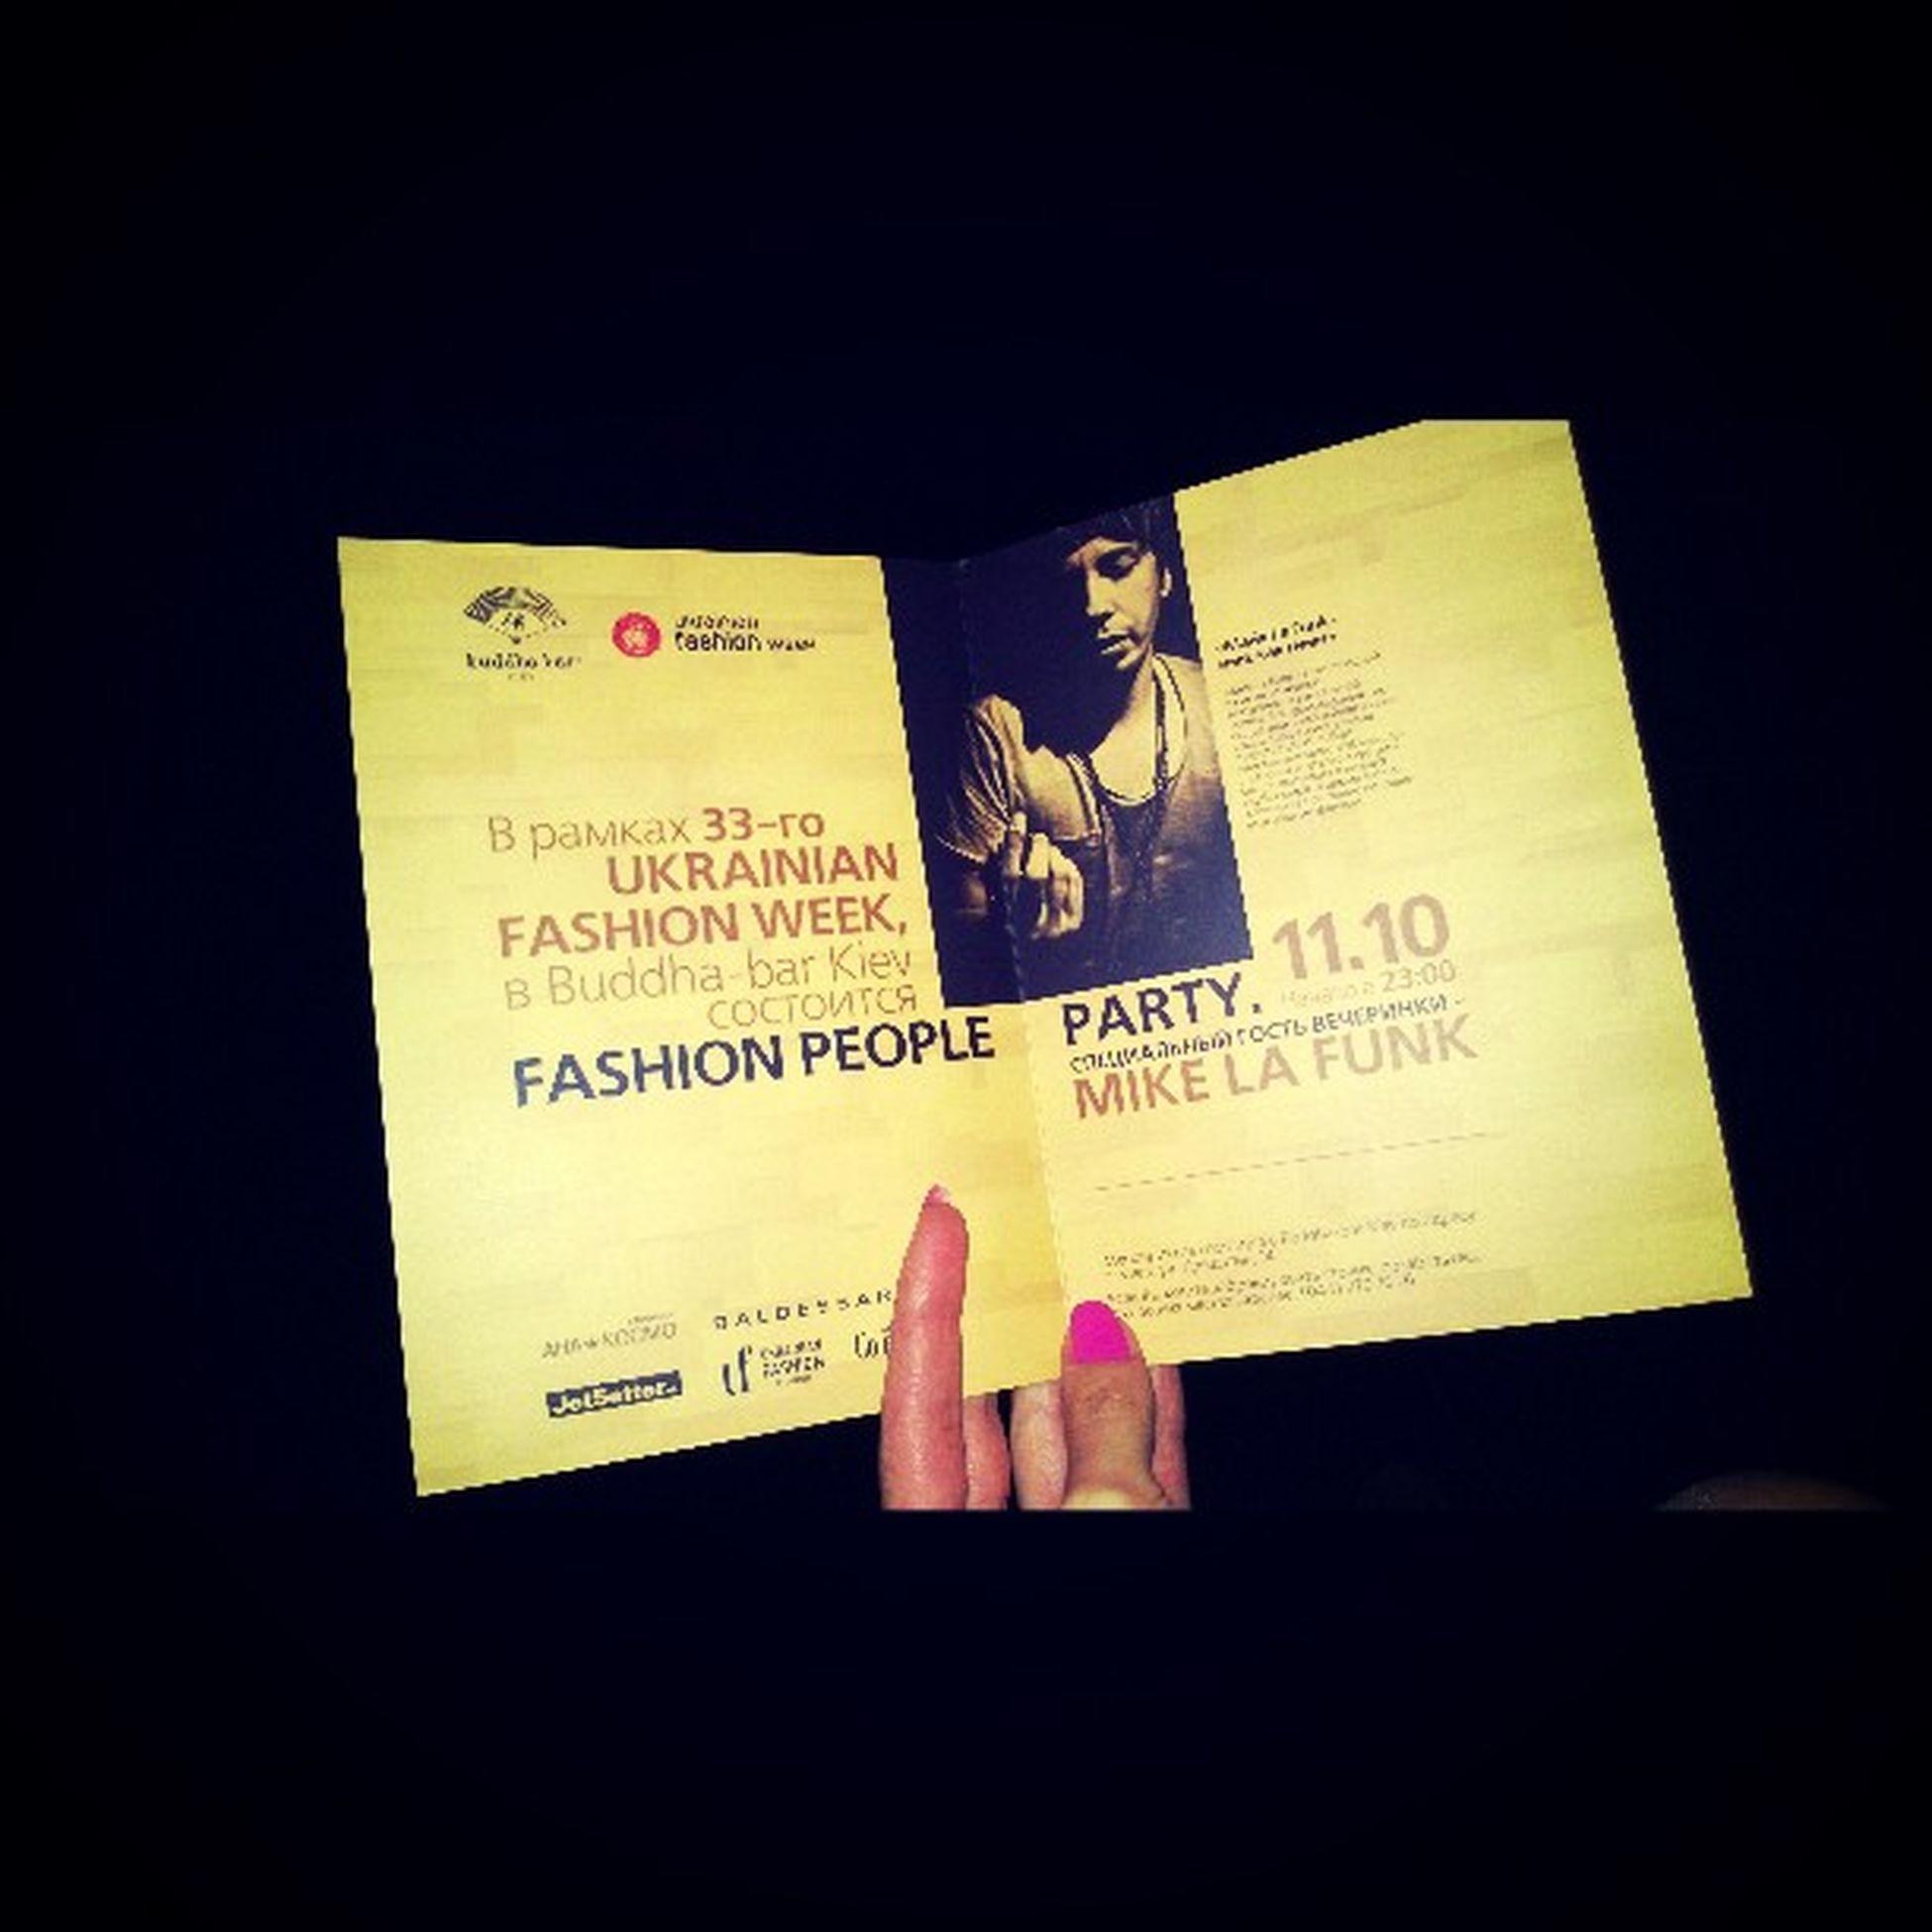 Вечеринка по поводу Ukrainian fashion week, идём все отмечать!))  показ Ukrainianfashionweek Kiev Buddabar fashion alishamodel